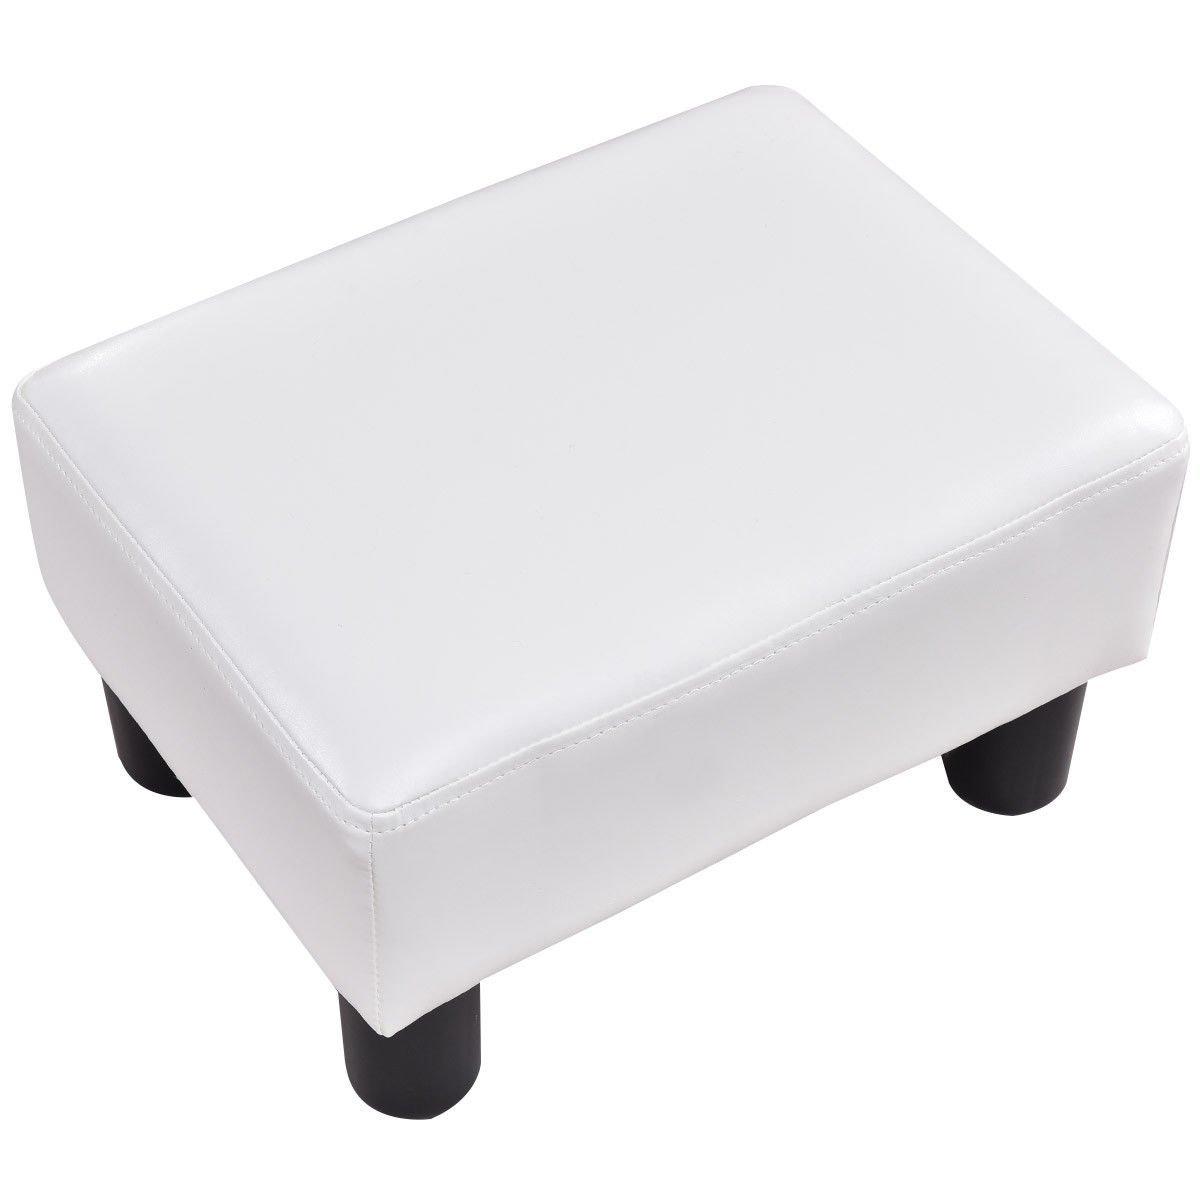 Giantex PU Leather Footstool Small Ottoman Rectangular Seat Stool with Plastic Wood Legs, White